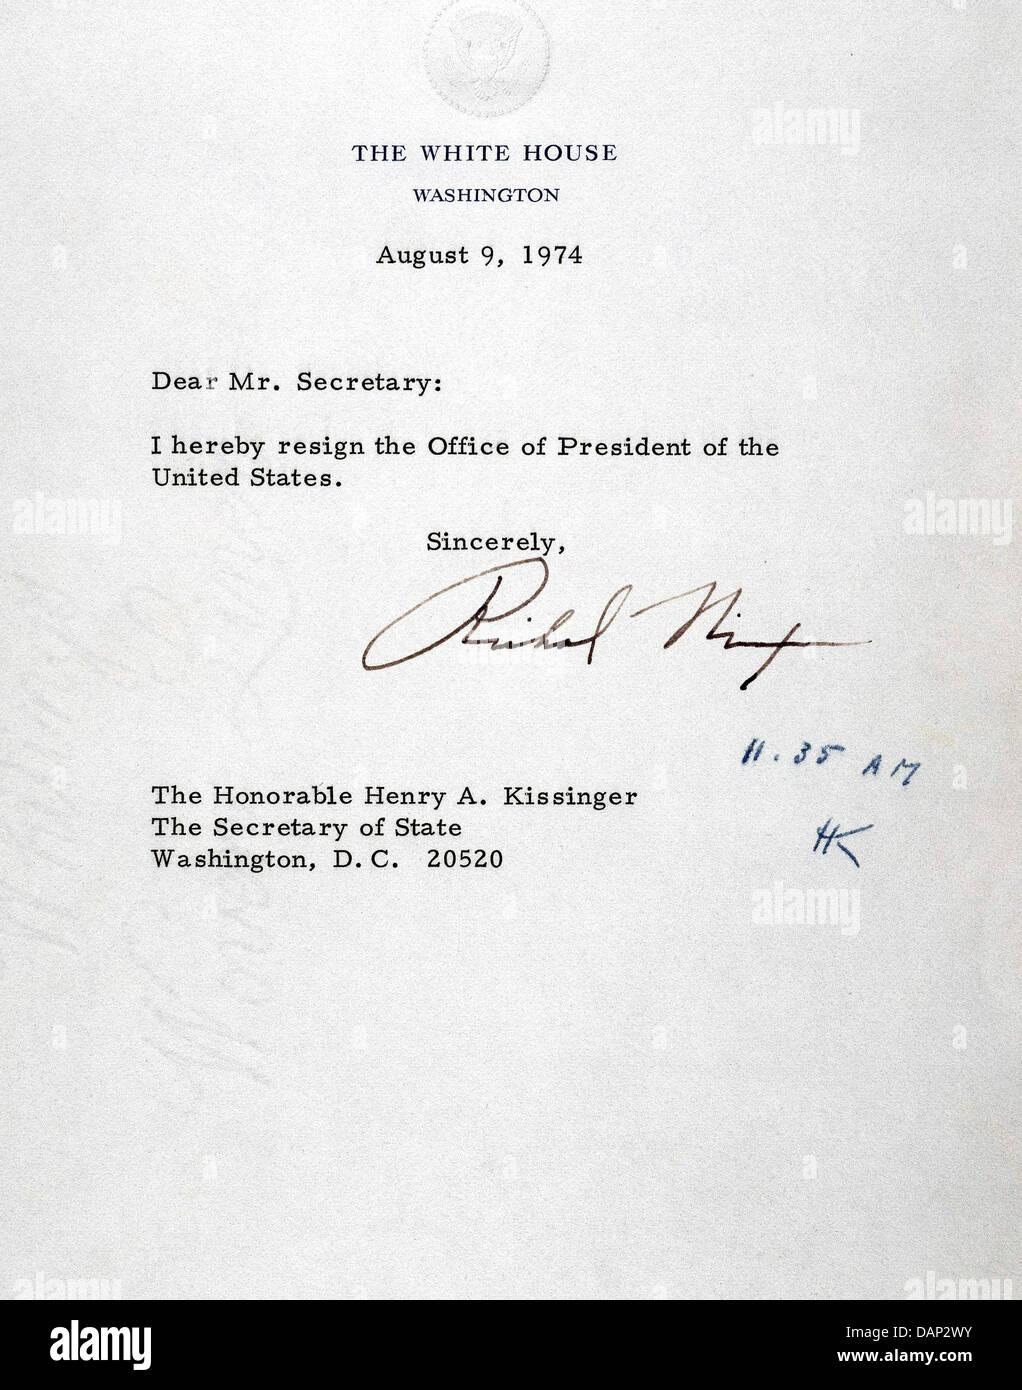 Richard Nixon Letter Of Resignation 9 August 1974 Stock Photo